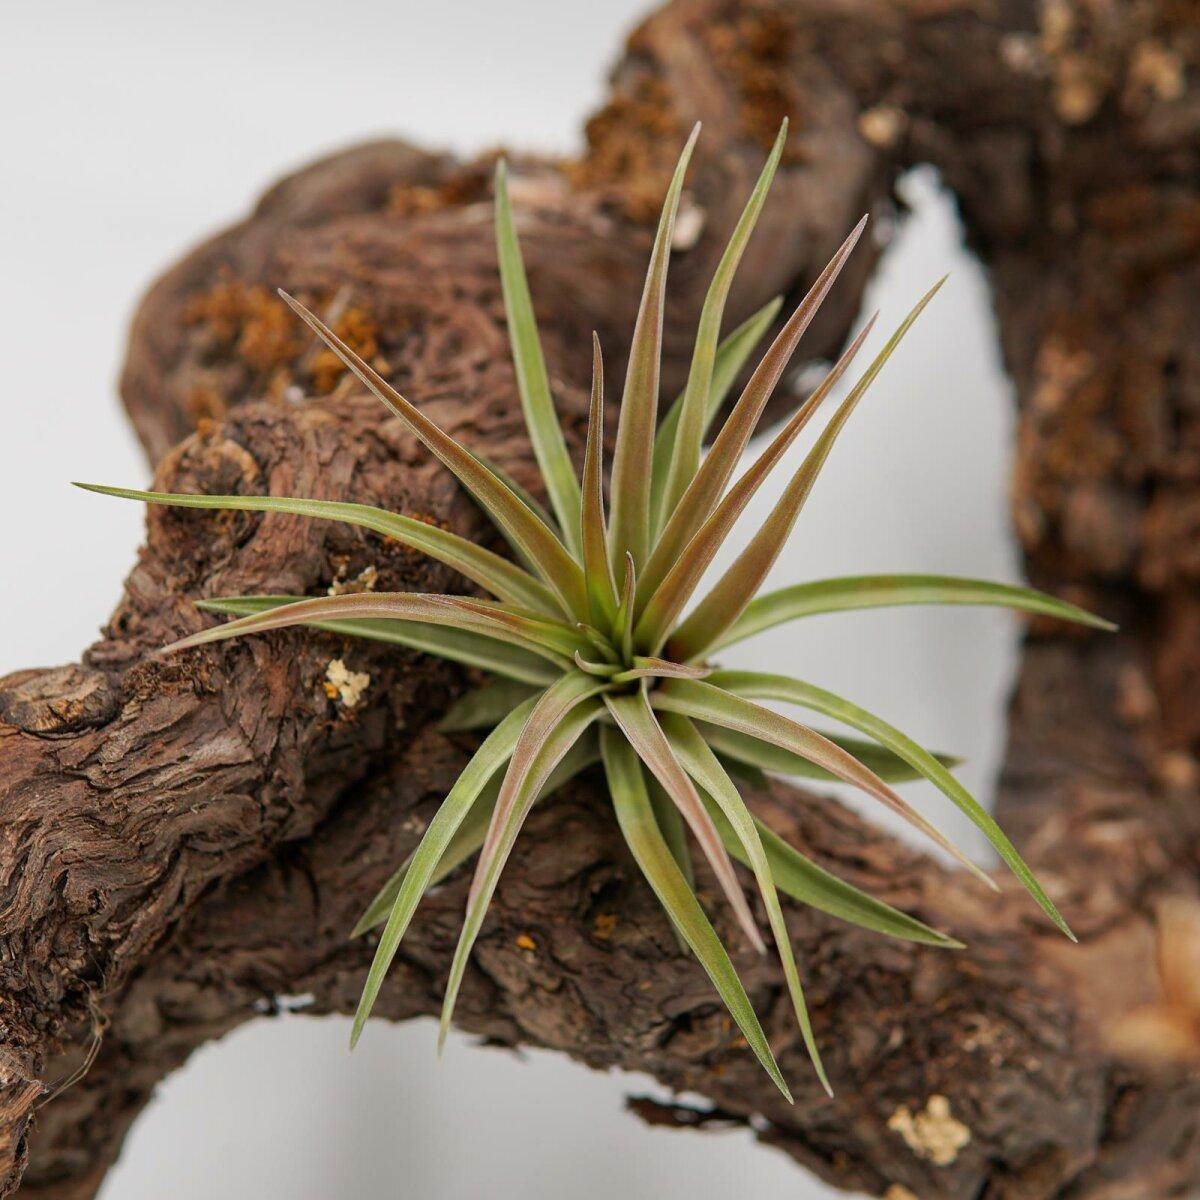 Tillandsien Kaufen tillandsia brachycaulos var multiflora pasiora